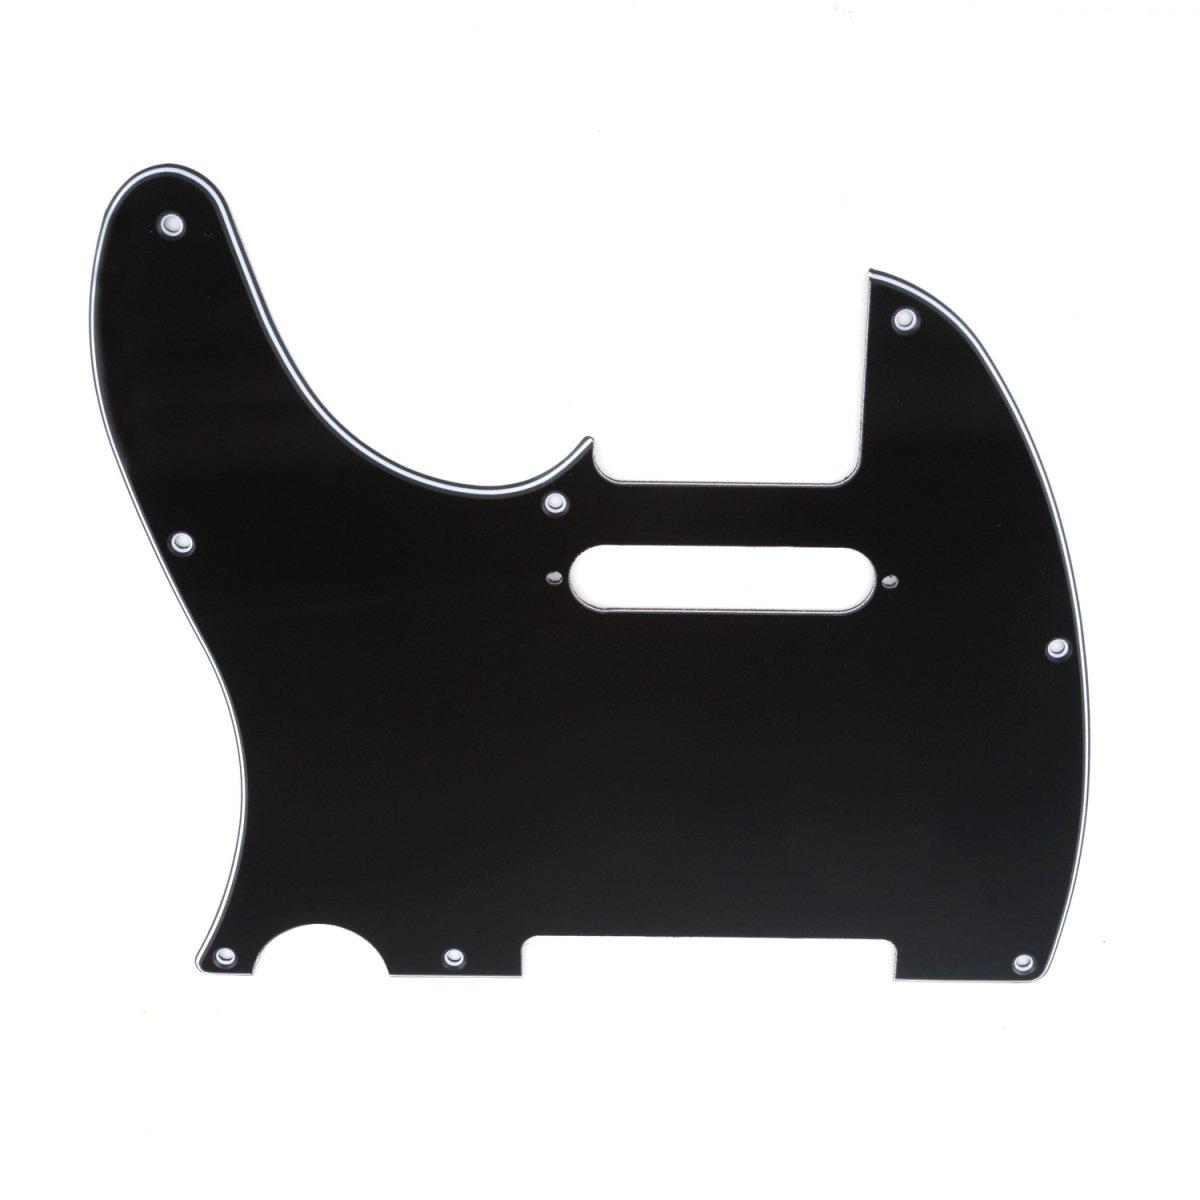 Musiclily 8 Agujeros Tele Pickguard Golpeador para Zurdos Fender American/México Standard Telecaster Estilo Moderno, 3 capas Negro: Amazon.es: Instrumentos ...